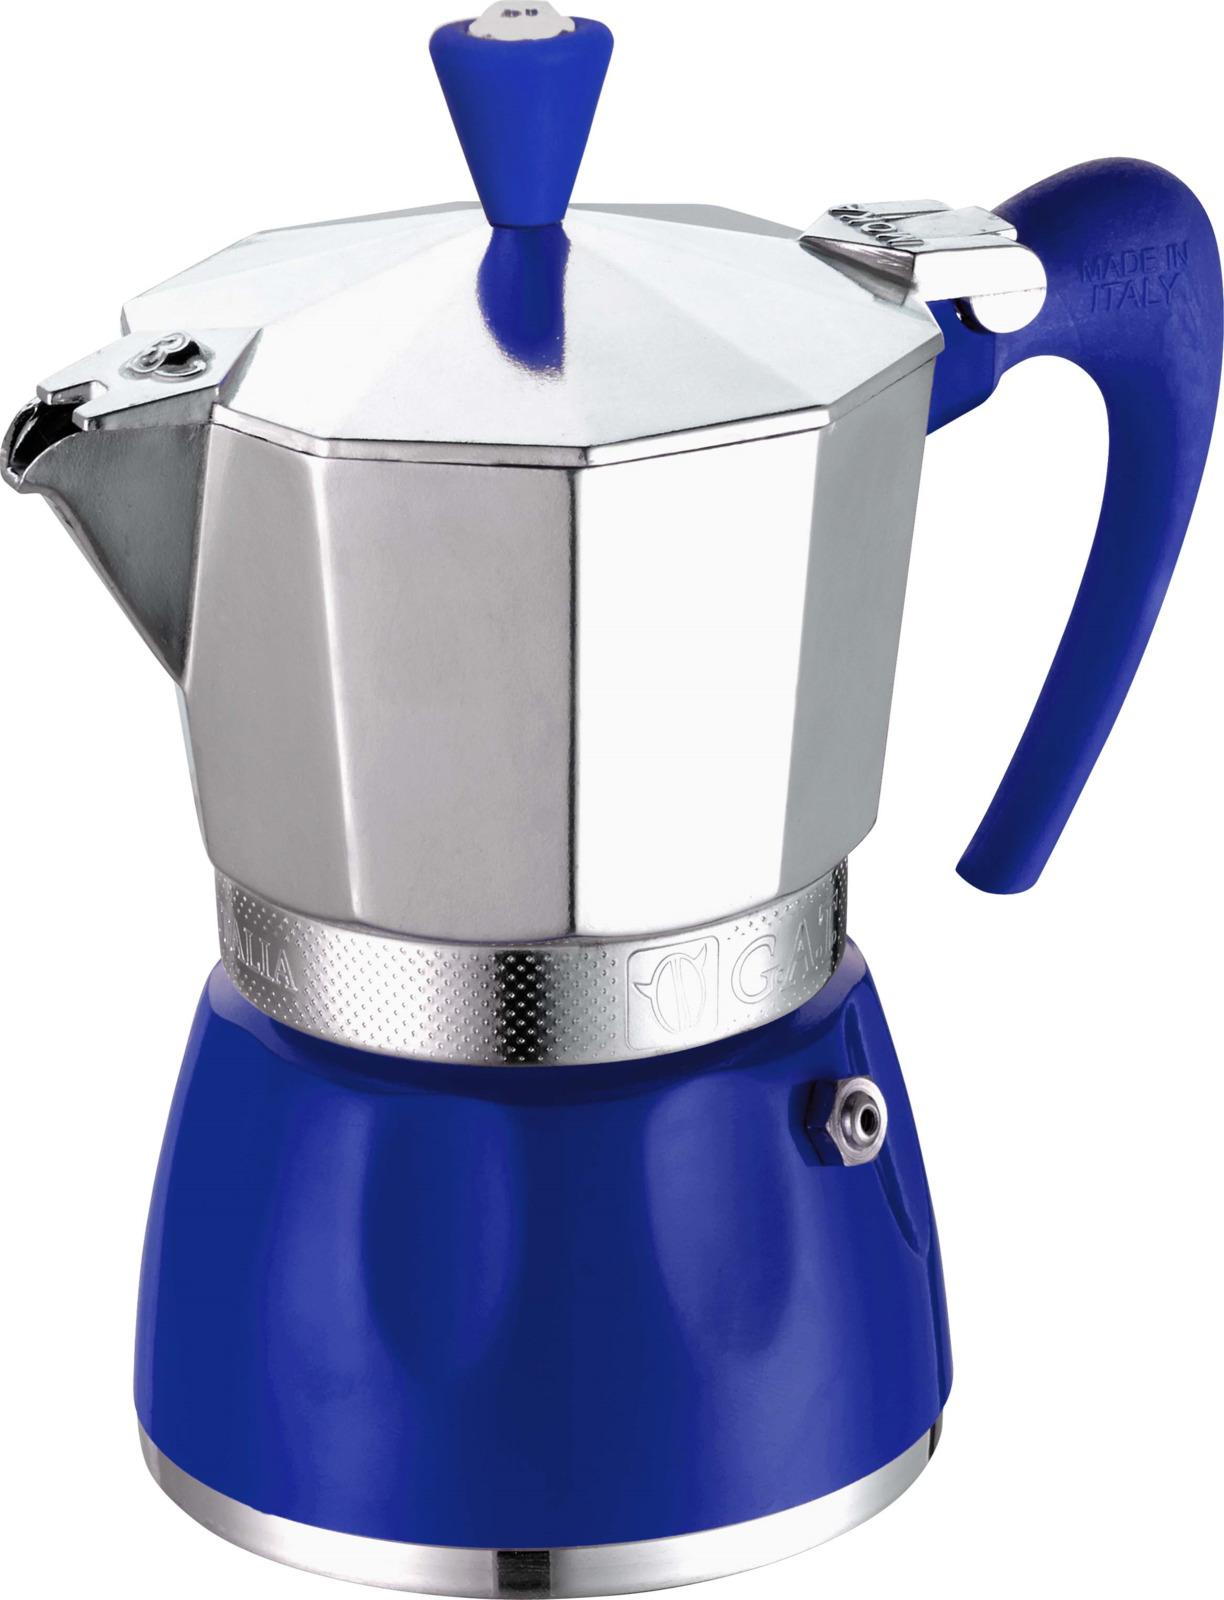 Кофеварка гейзерная G.A.T. Delizia, цвет: синий, на 2 чашки g a t delizia 2 чашки